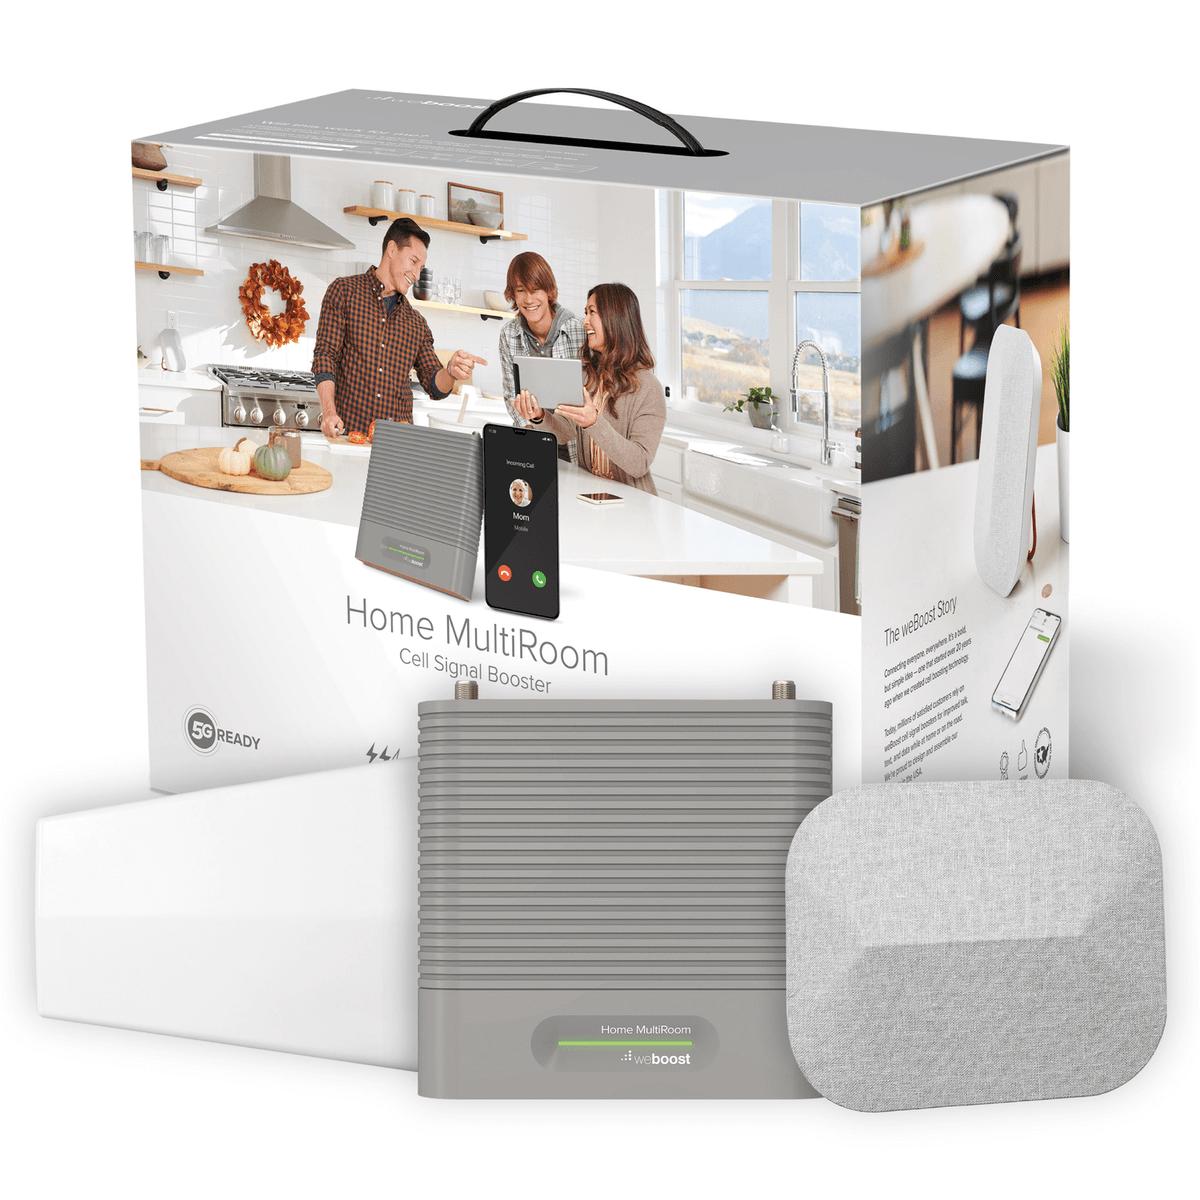 weBoost Home MultiRoom Signal Booster Kit - 650144